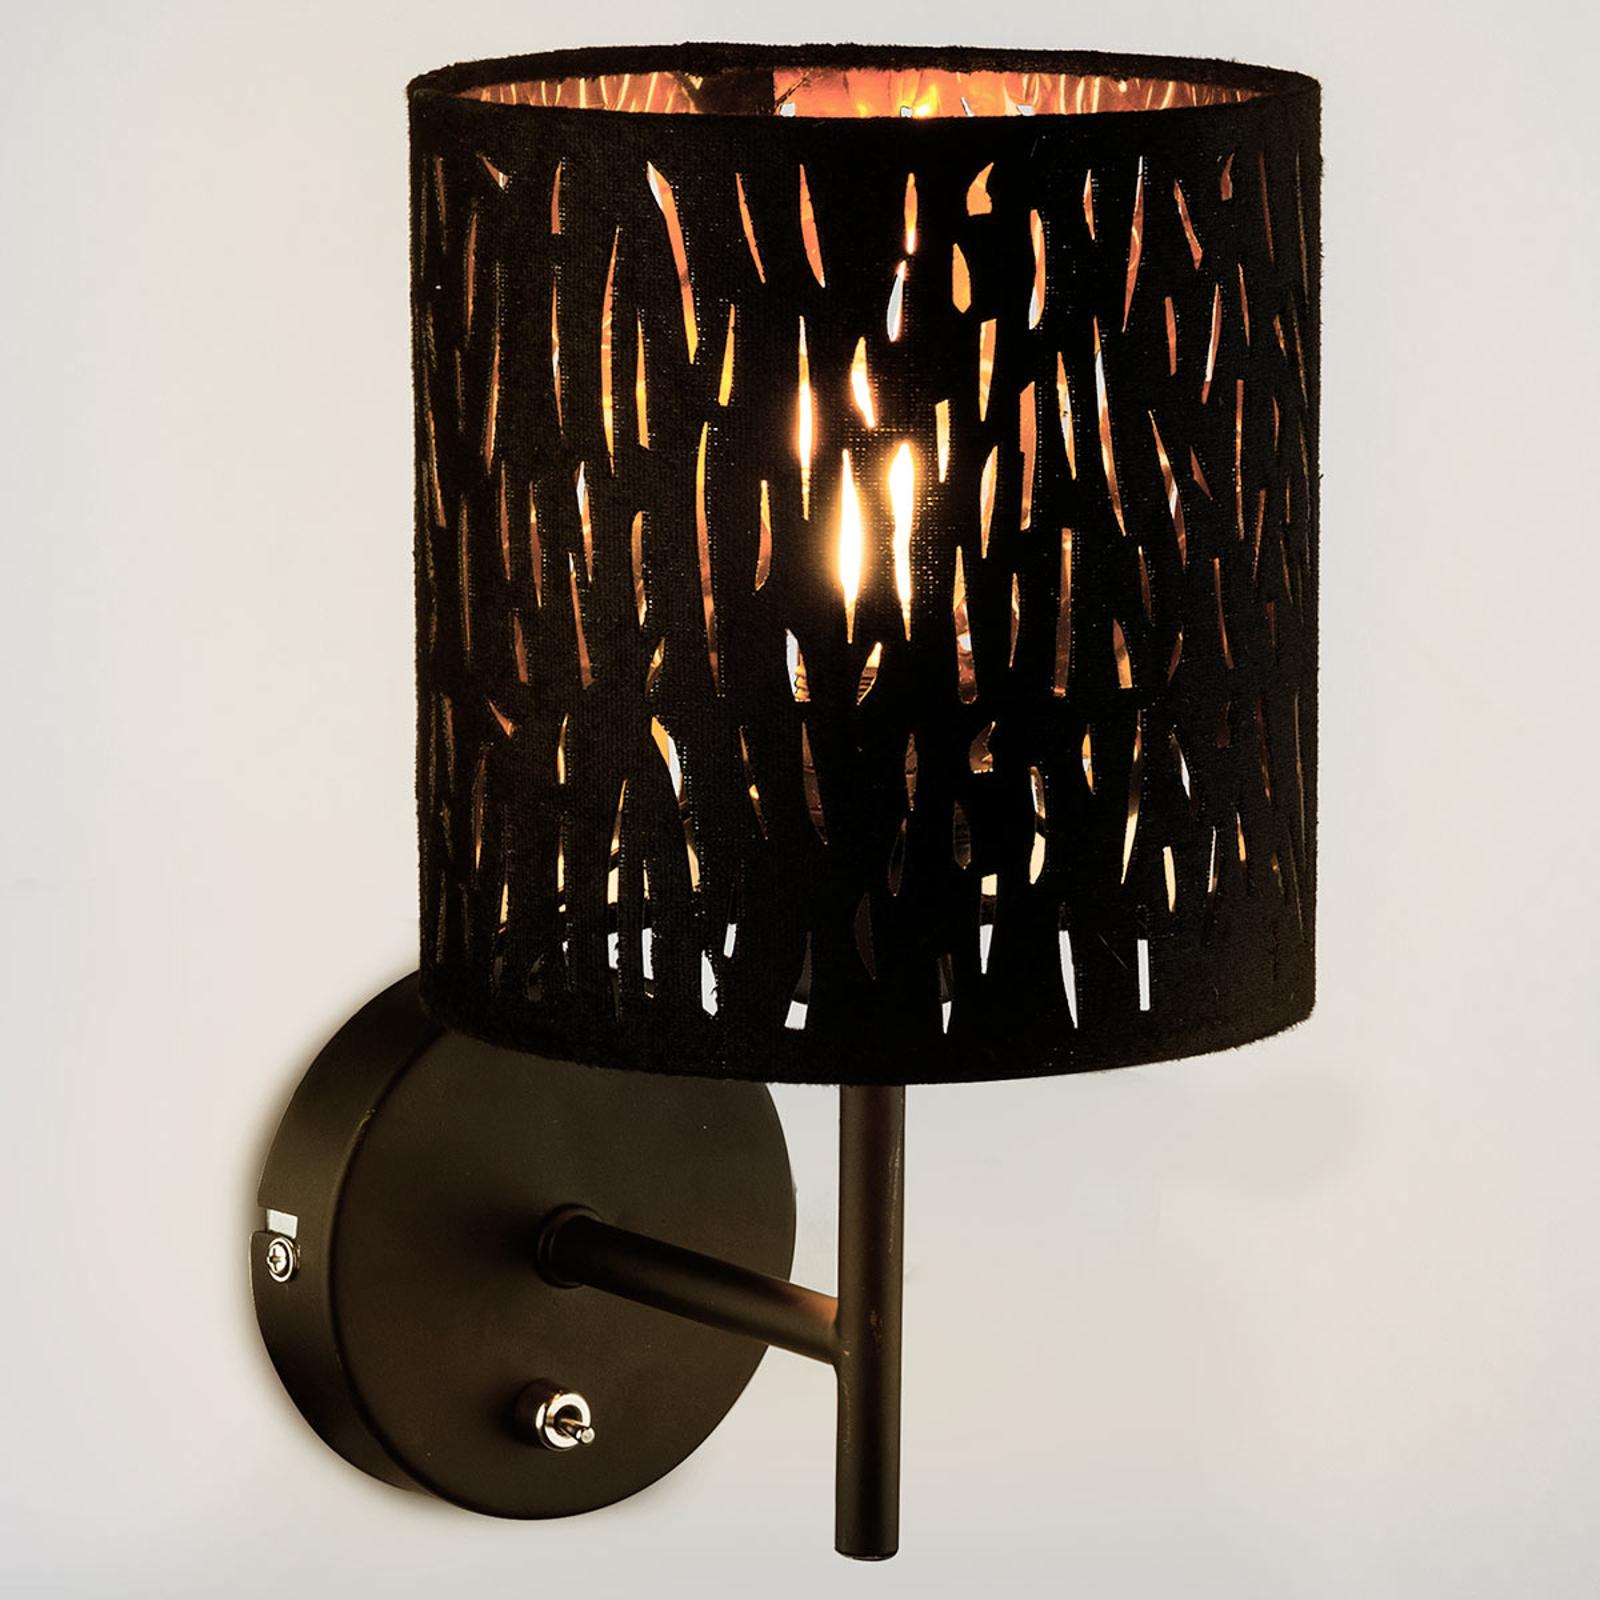 Wandlamp Tuxon met zwart-gouden kap